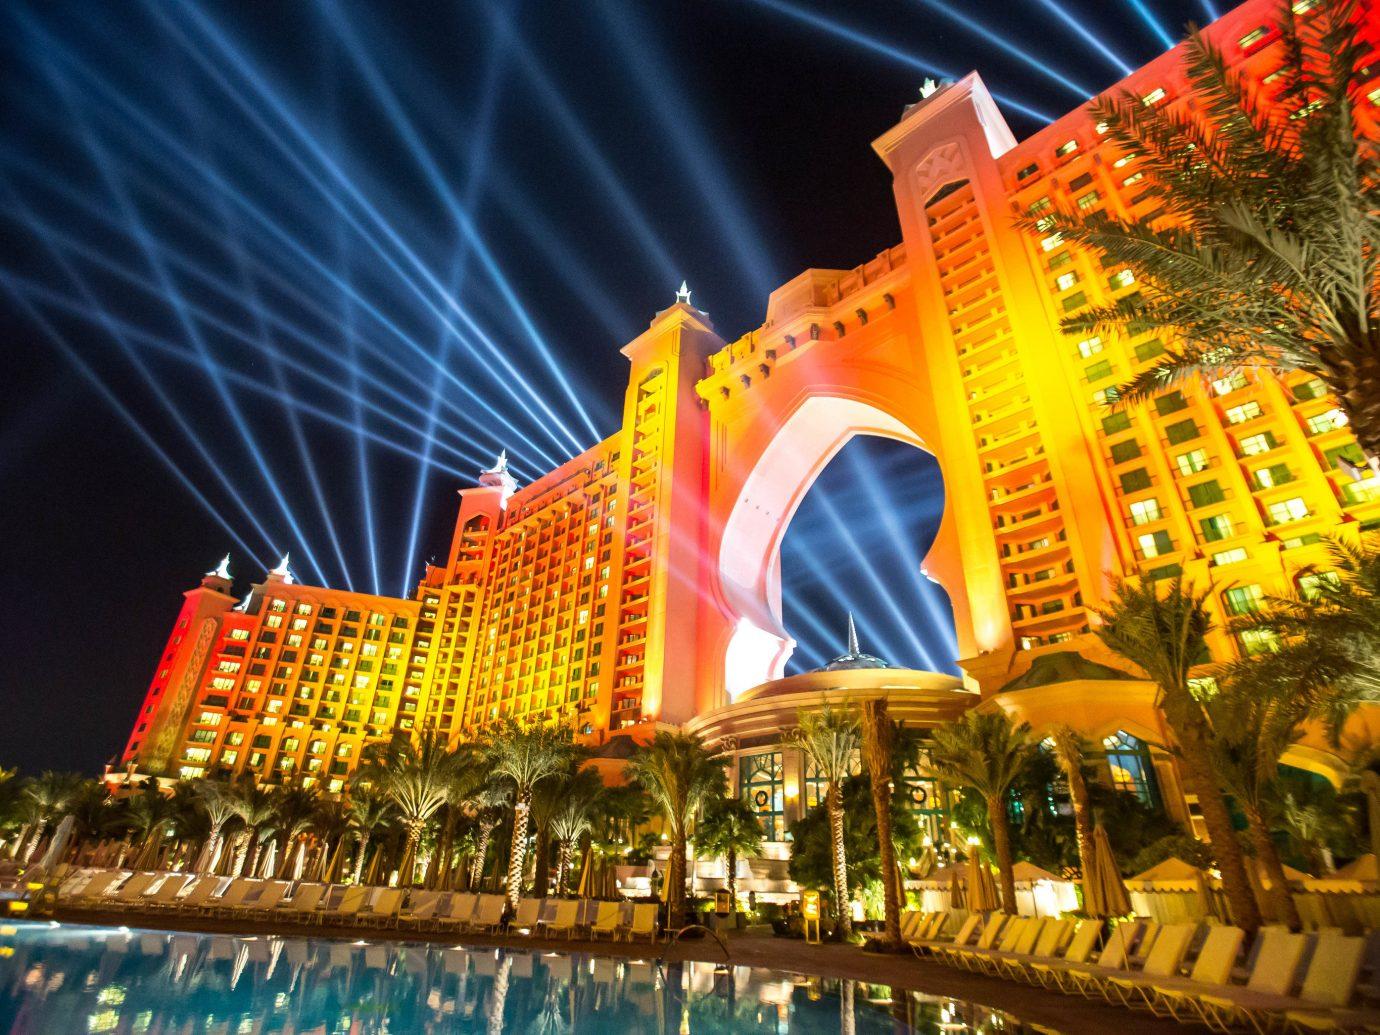 Trip Ideas building night light amusement park Resort festival